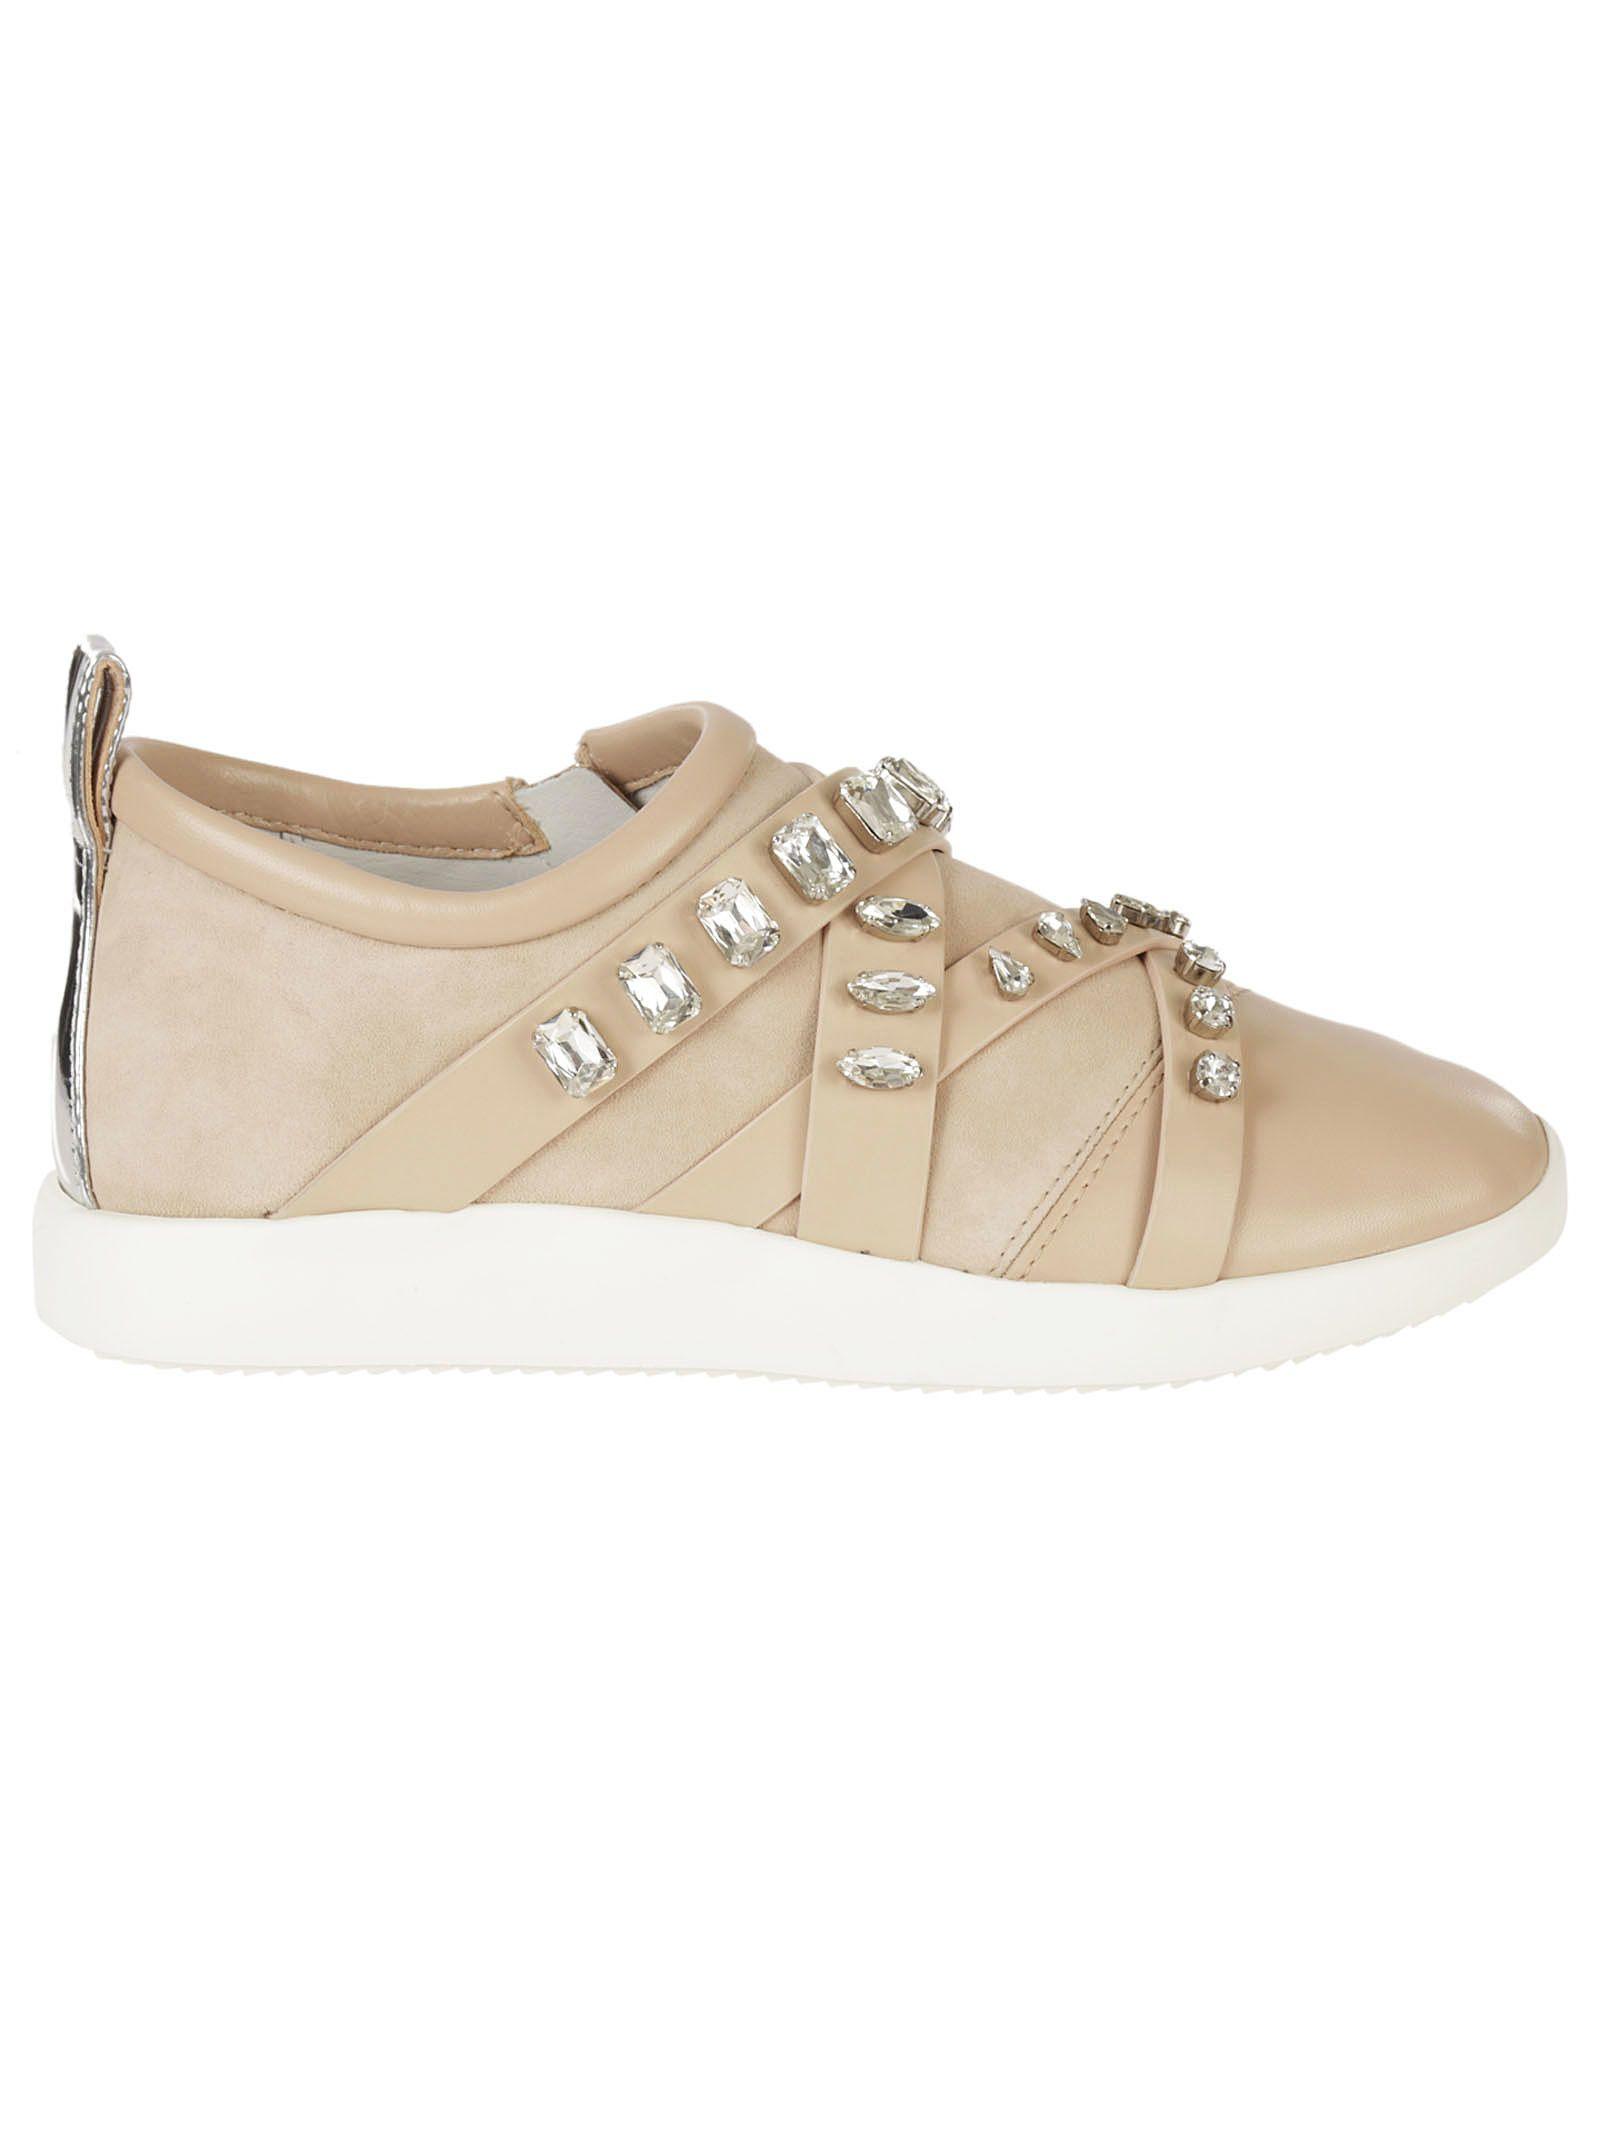 Giuseppe Zanotti Embellished Strap Slip-on Sneakers